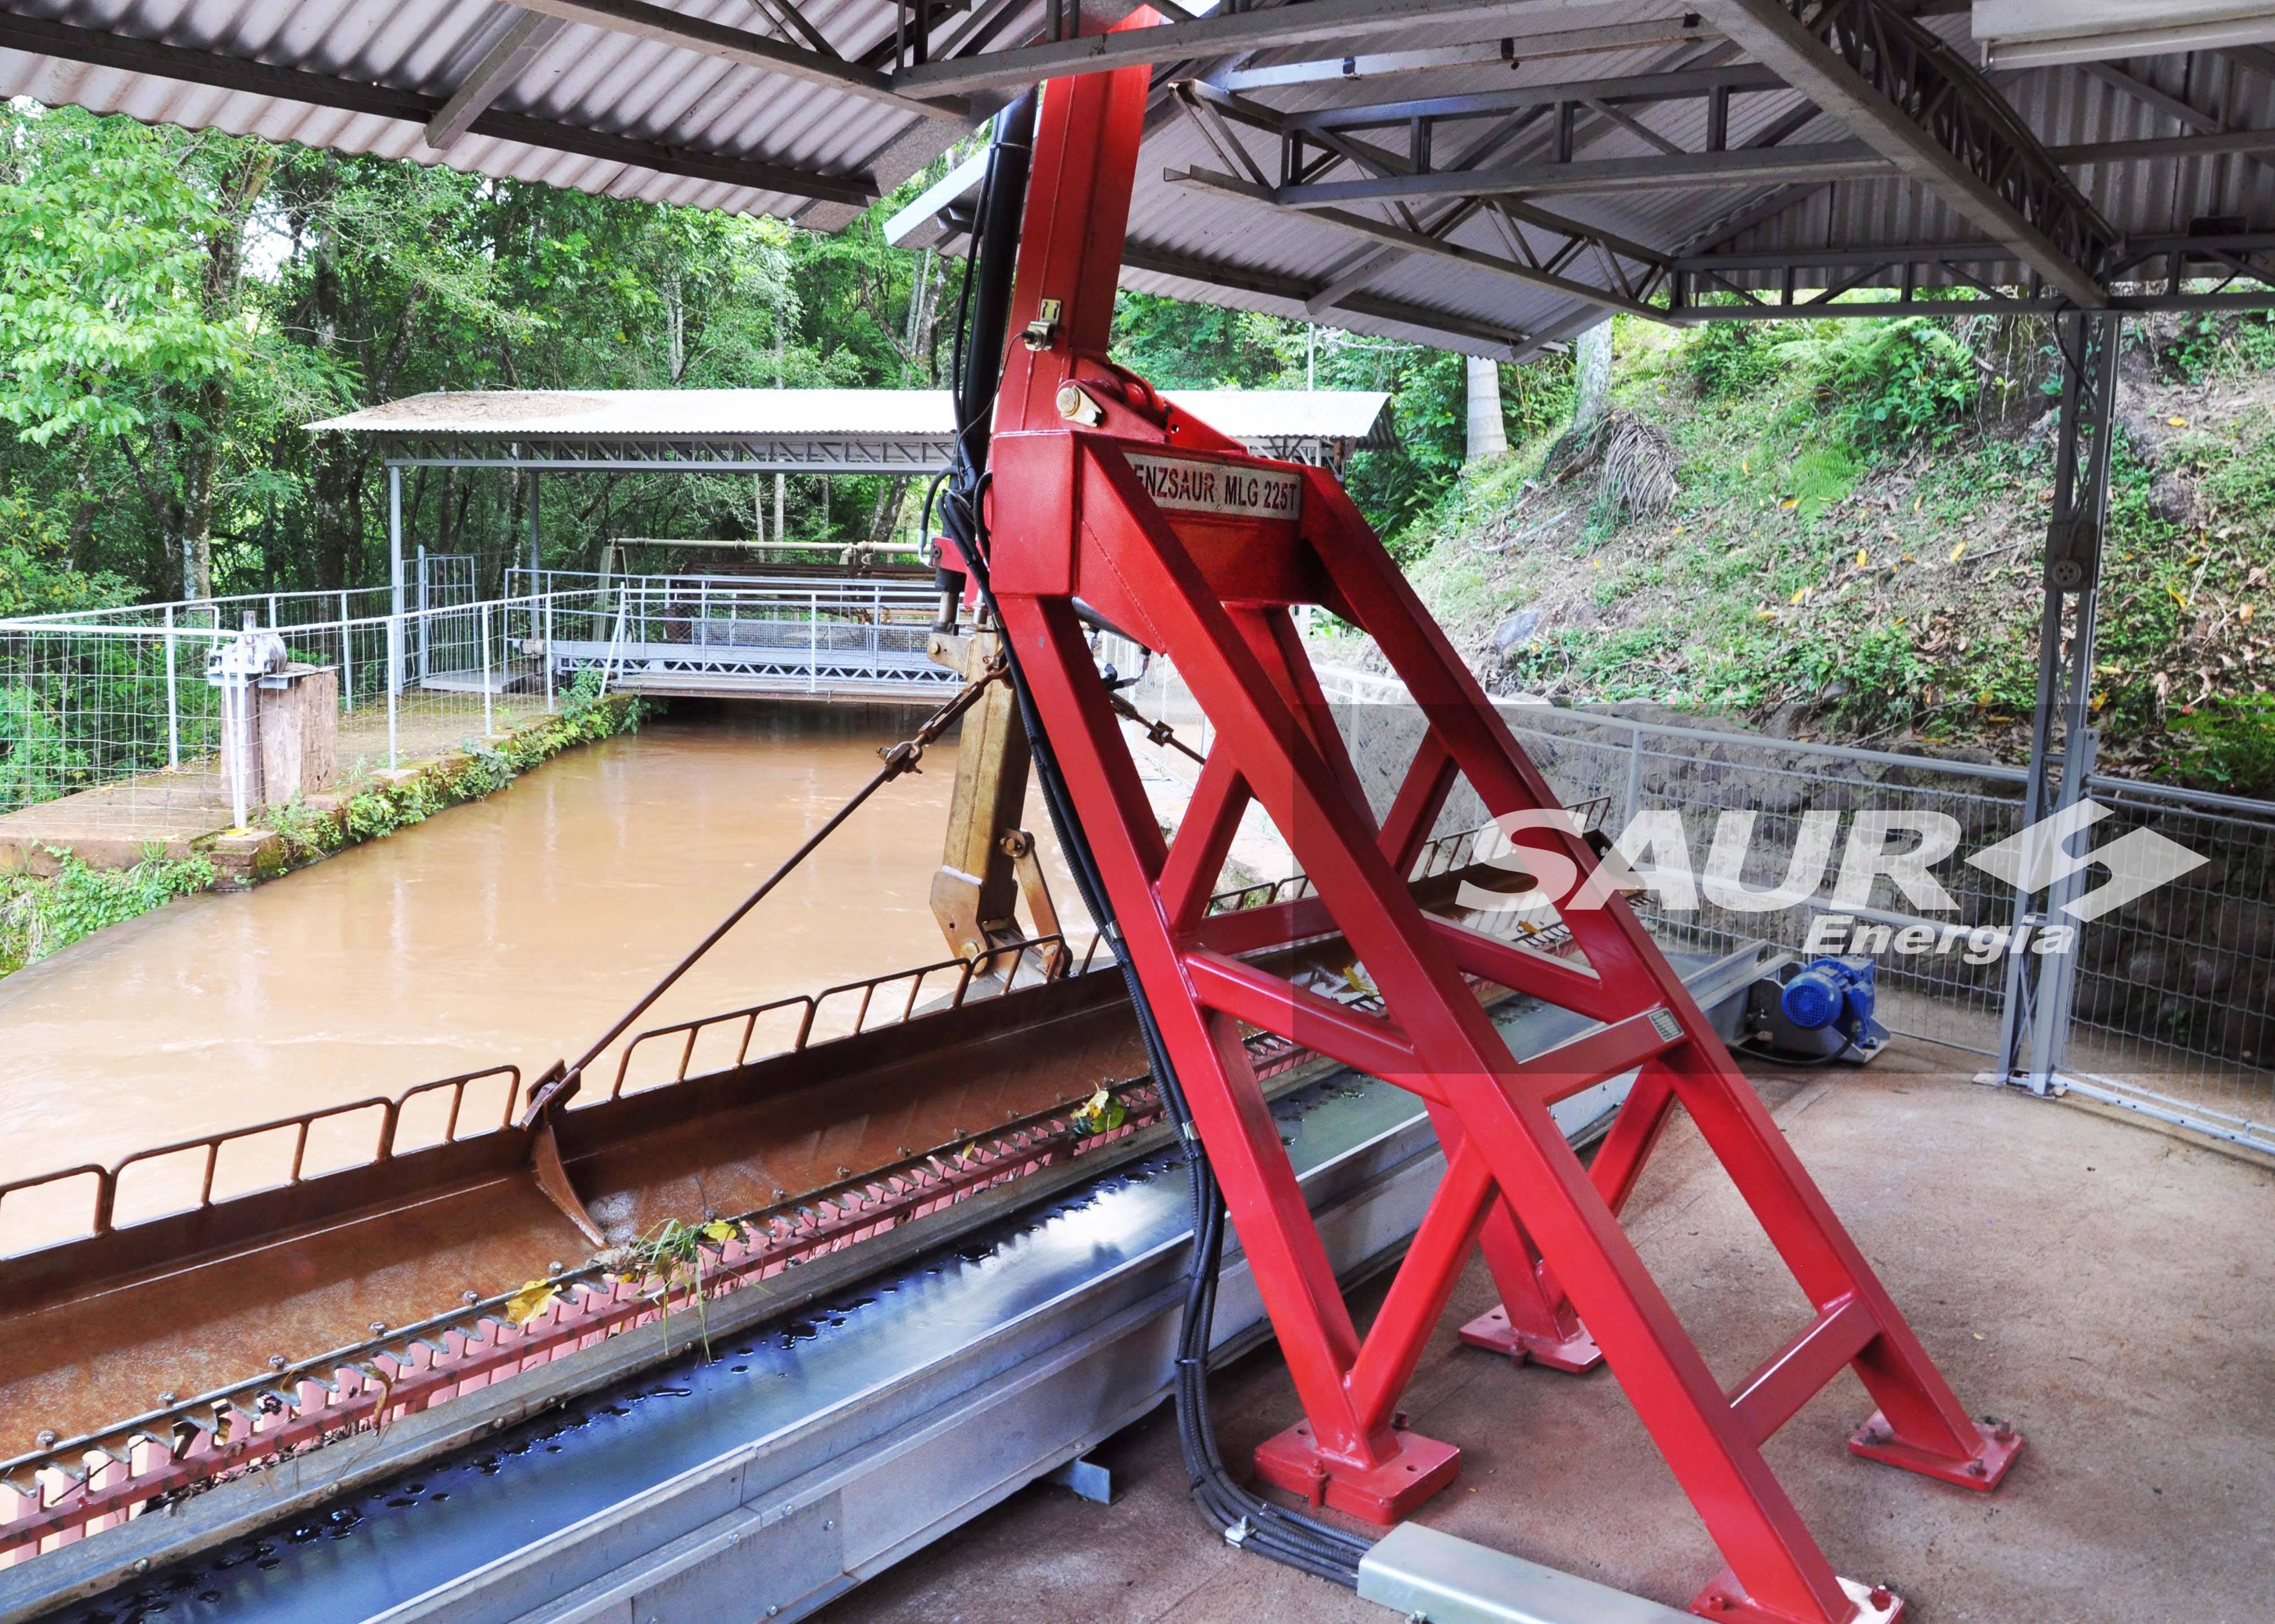 Máquina Limpa Grades para Usinas Hidrelétricas - PCH